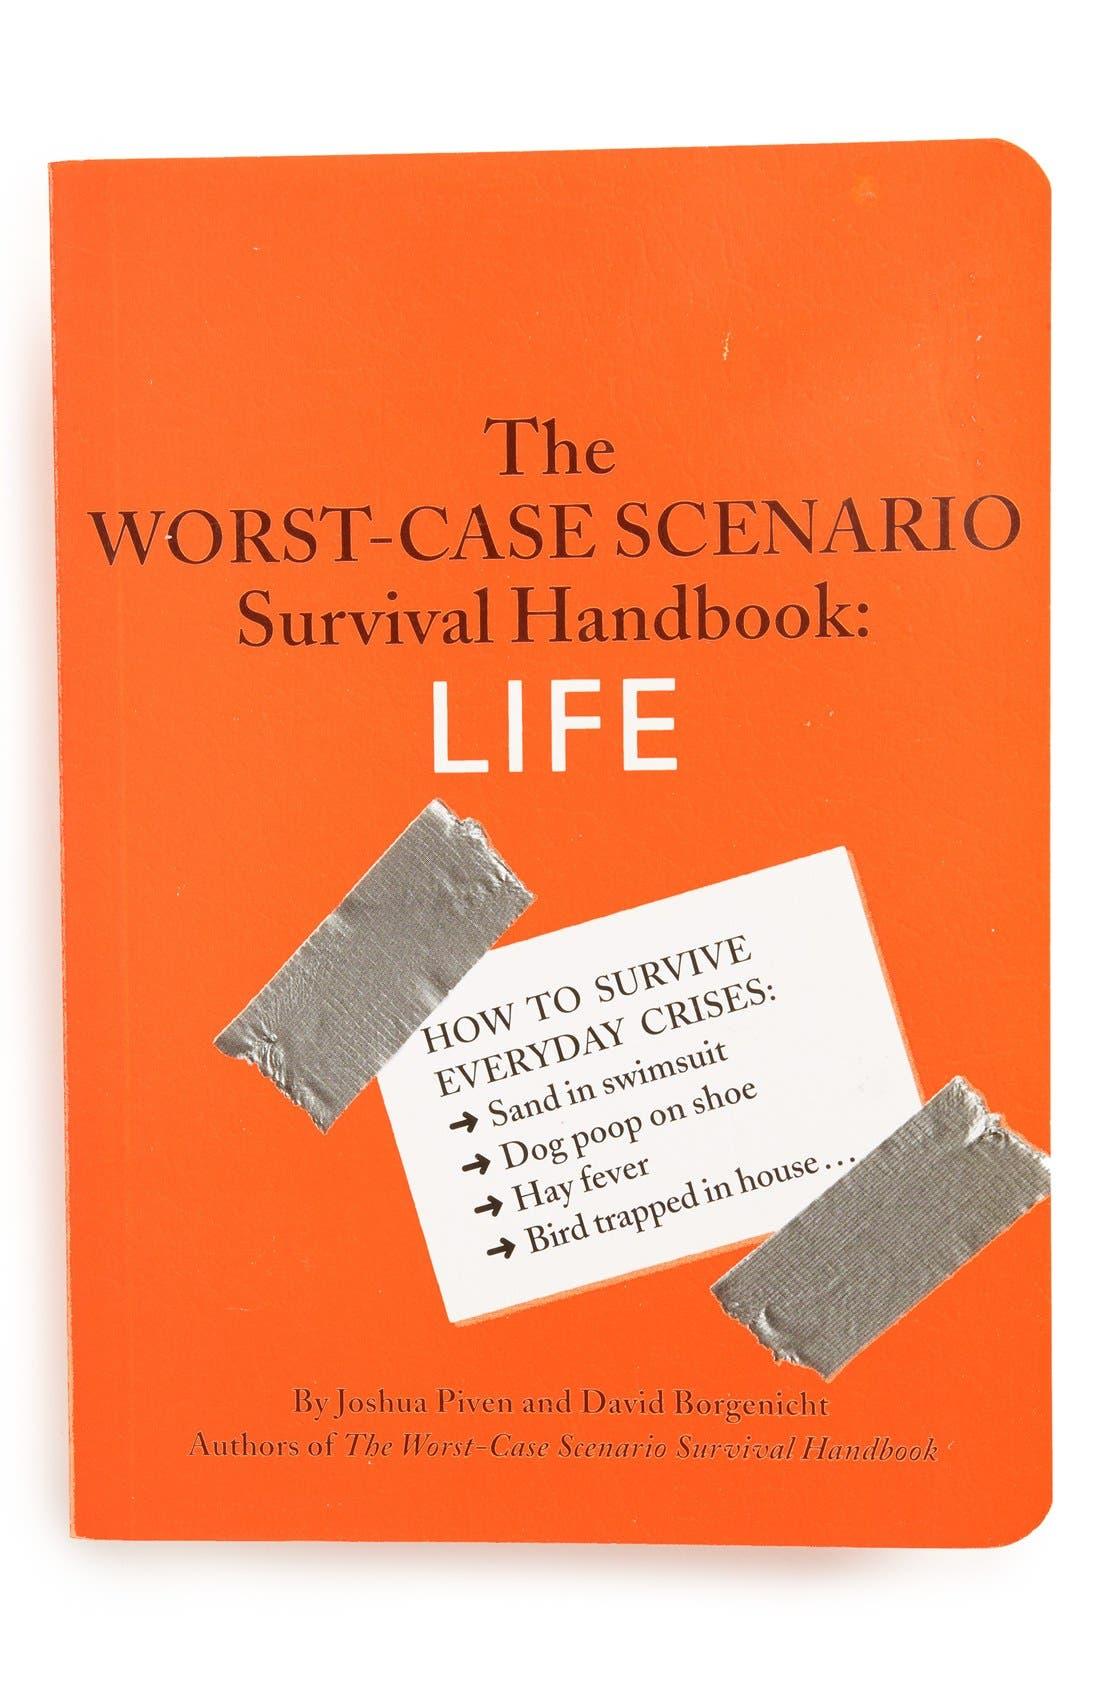 Alternate Image 1 Selected - 'The Worst-Case Scenario Survival Handbook: Life' Book